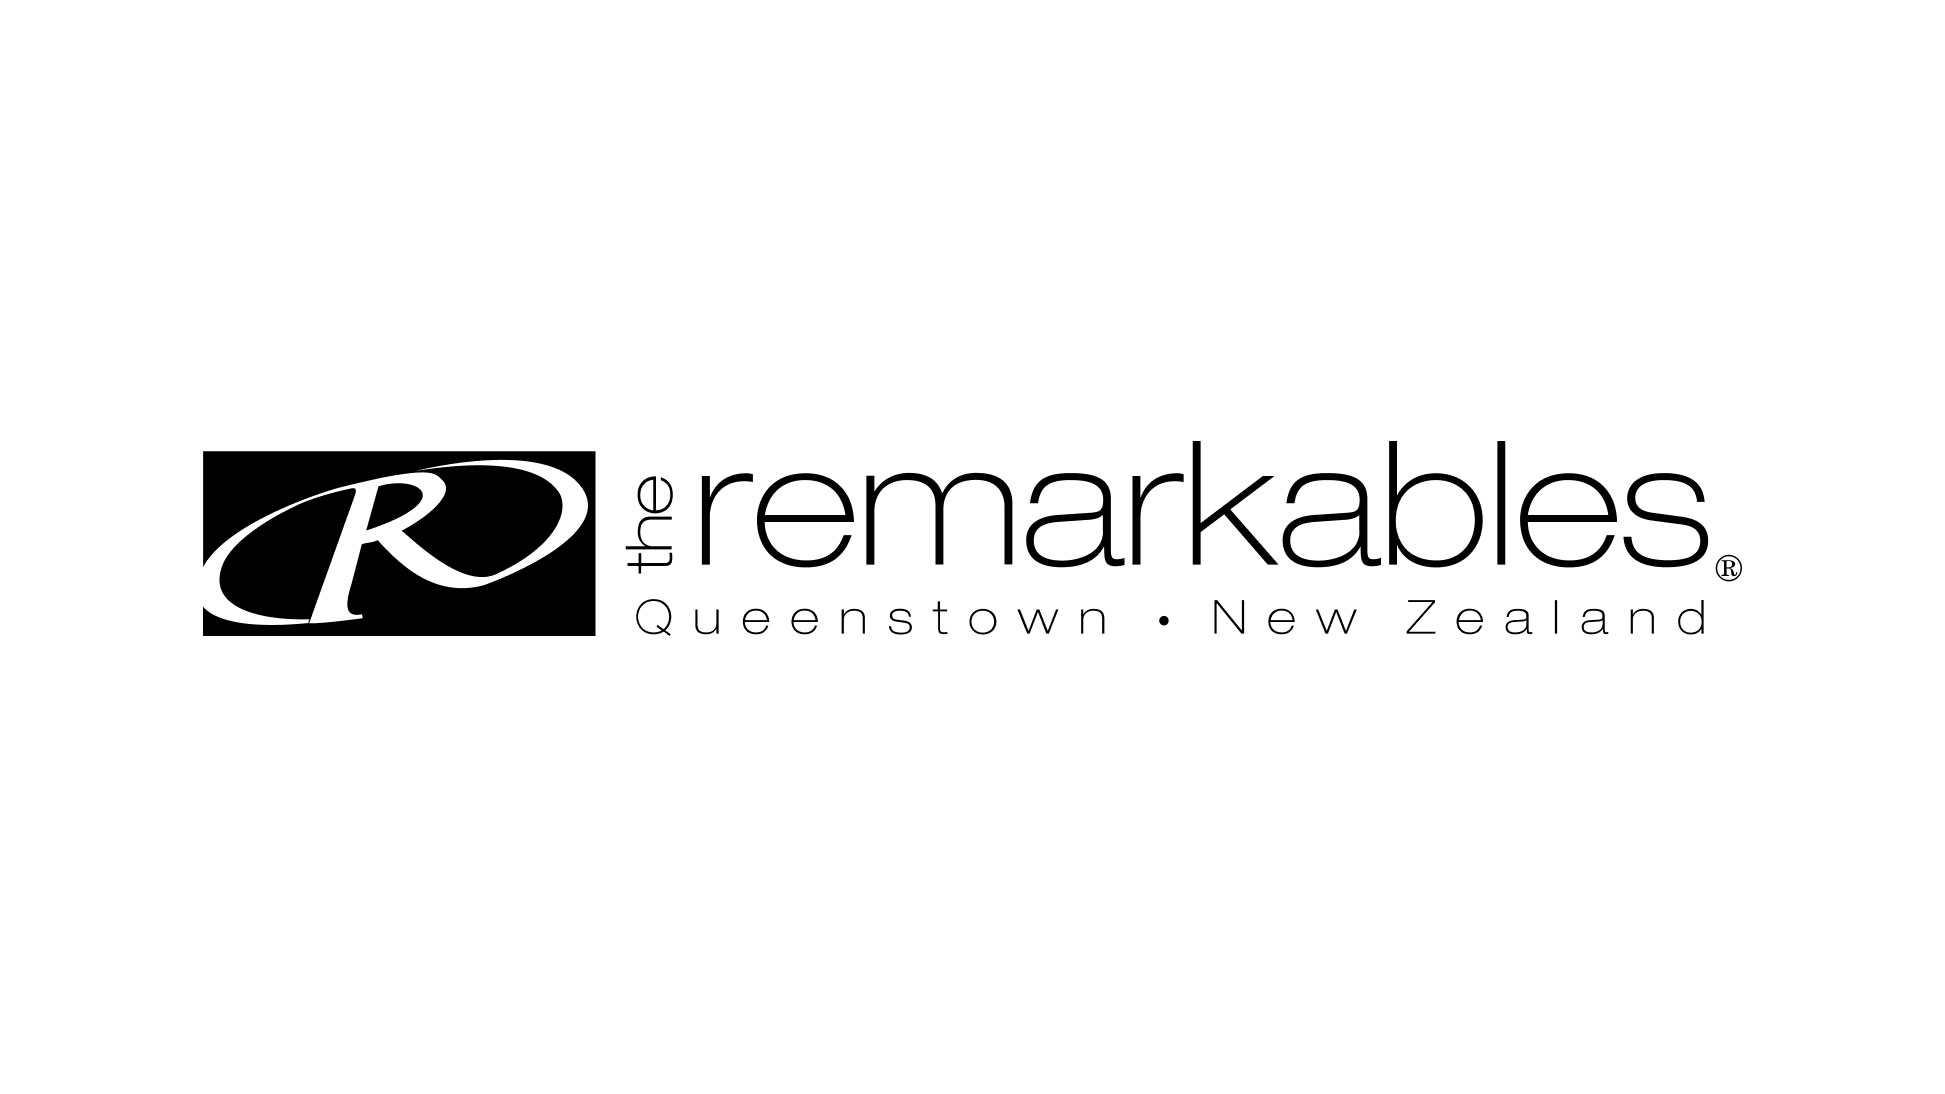 The Remarkables Logo